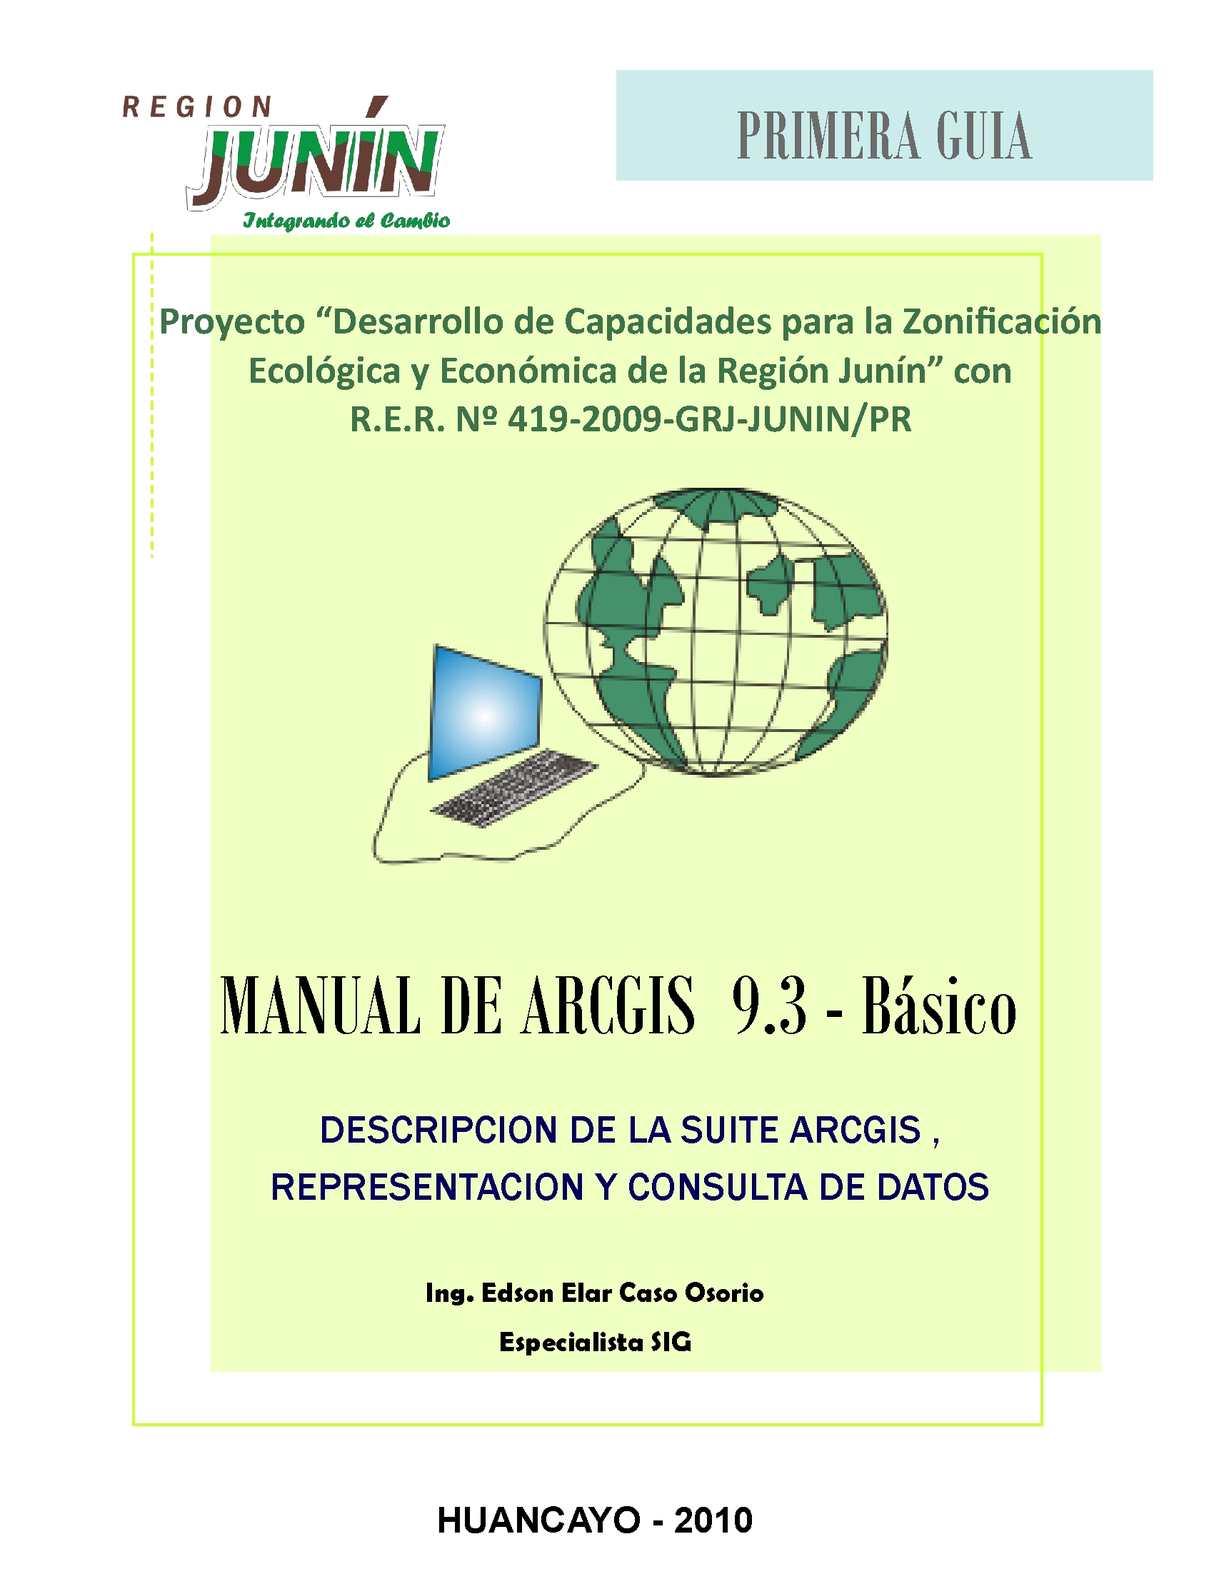 Manual Of Gis9 3 Auto Electrical Wiring Diagram 2000 Mitsubishi Mirage Fuse Box Map